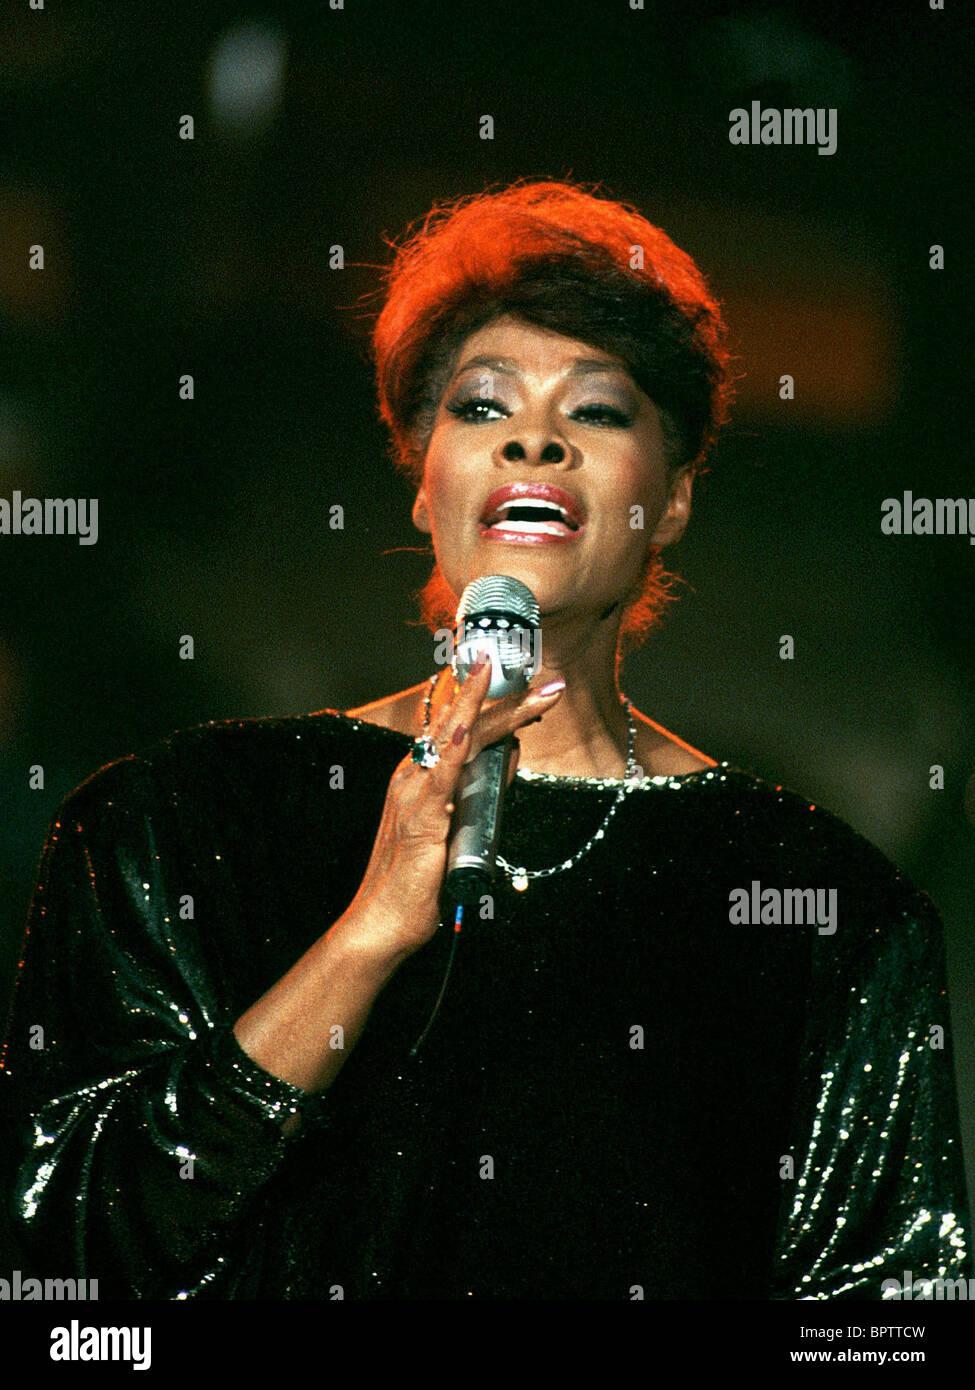 DIONNE WARWICK Singer (1989) Imagen De Stock